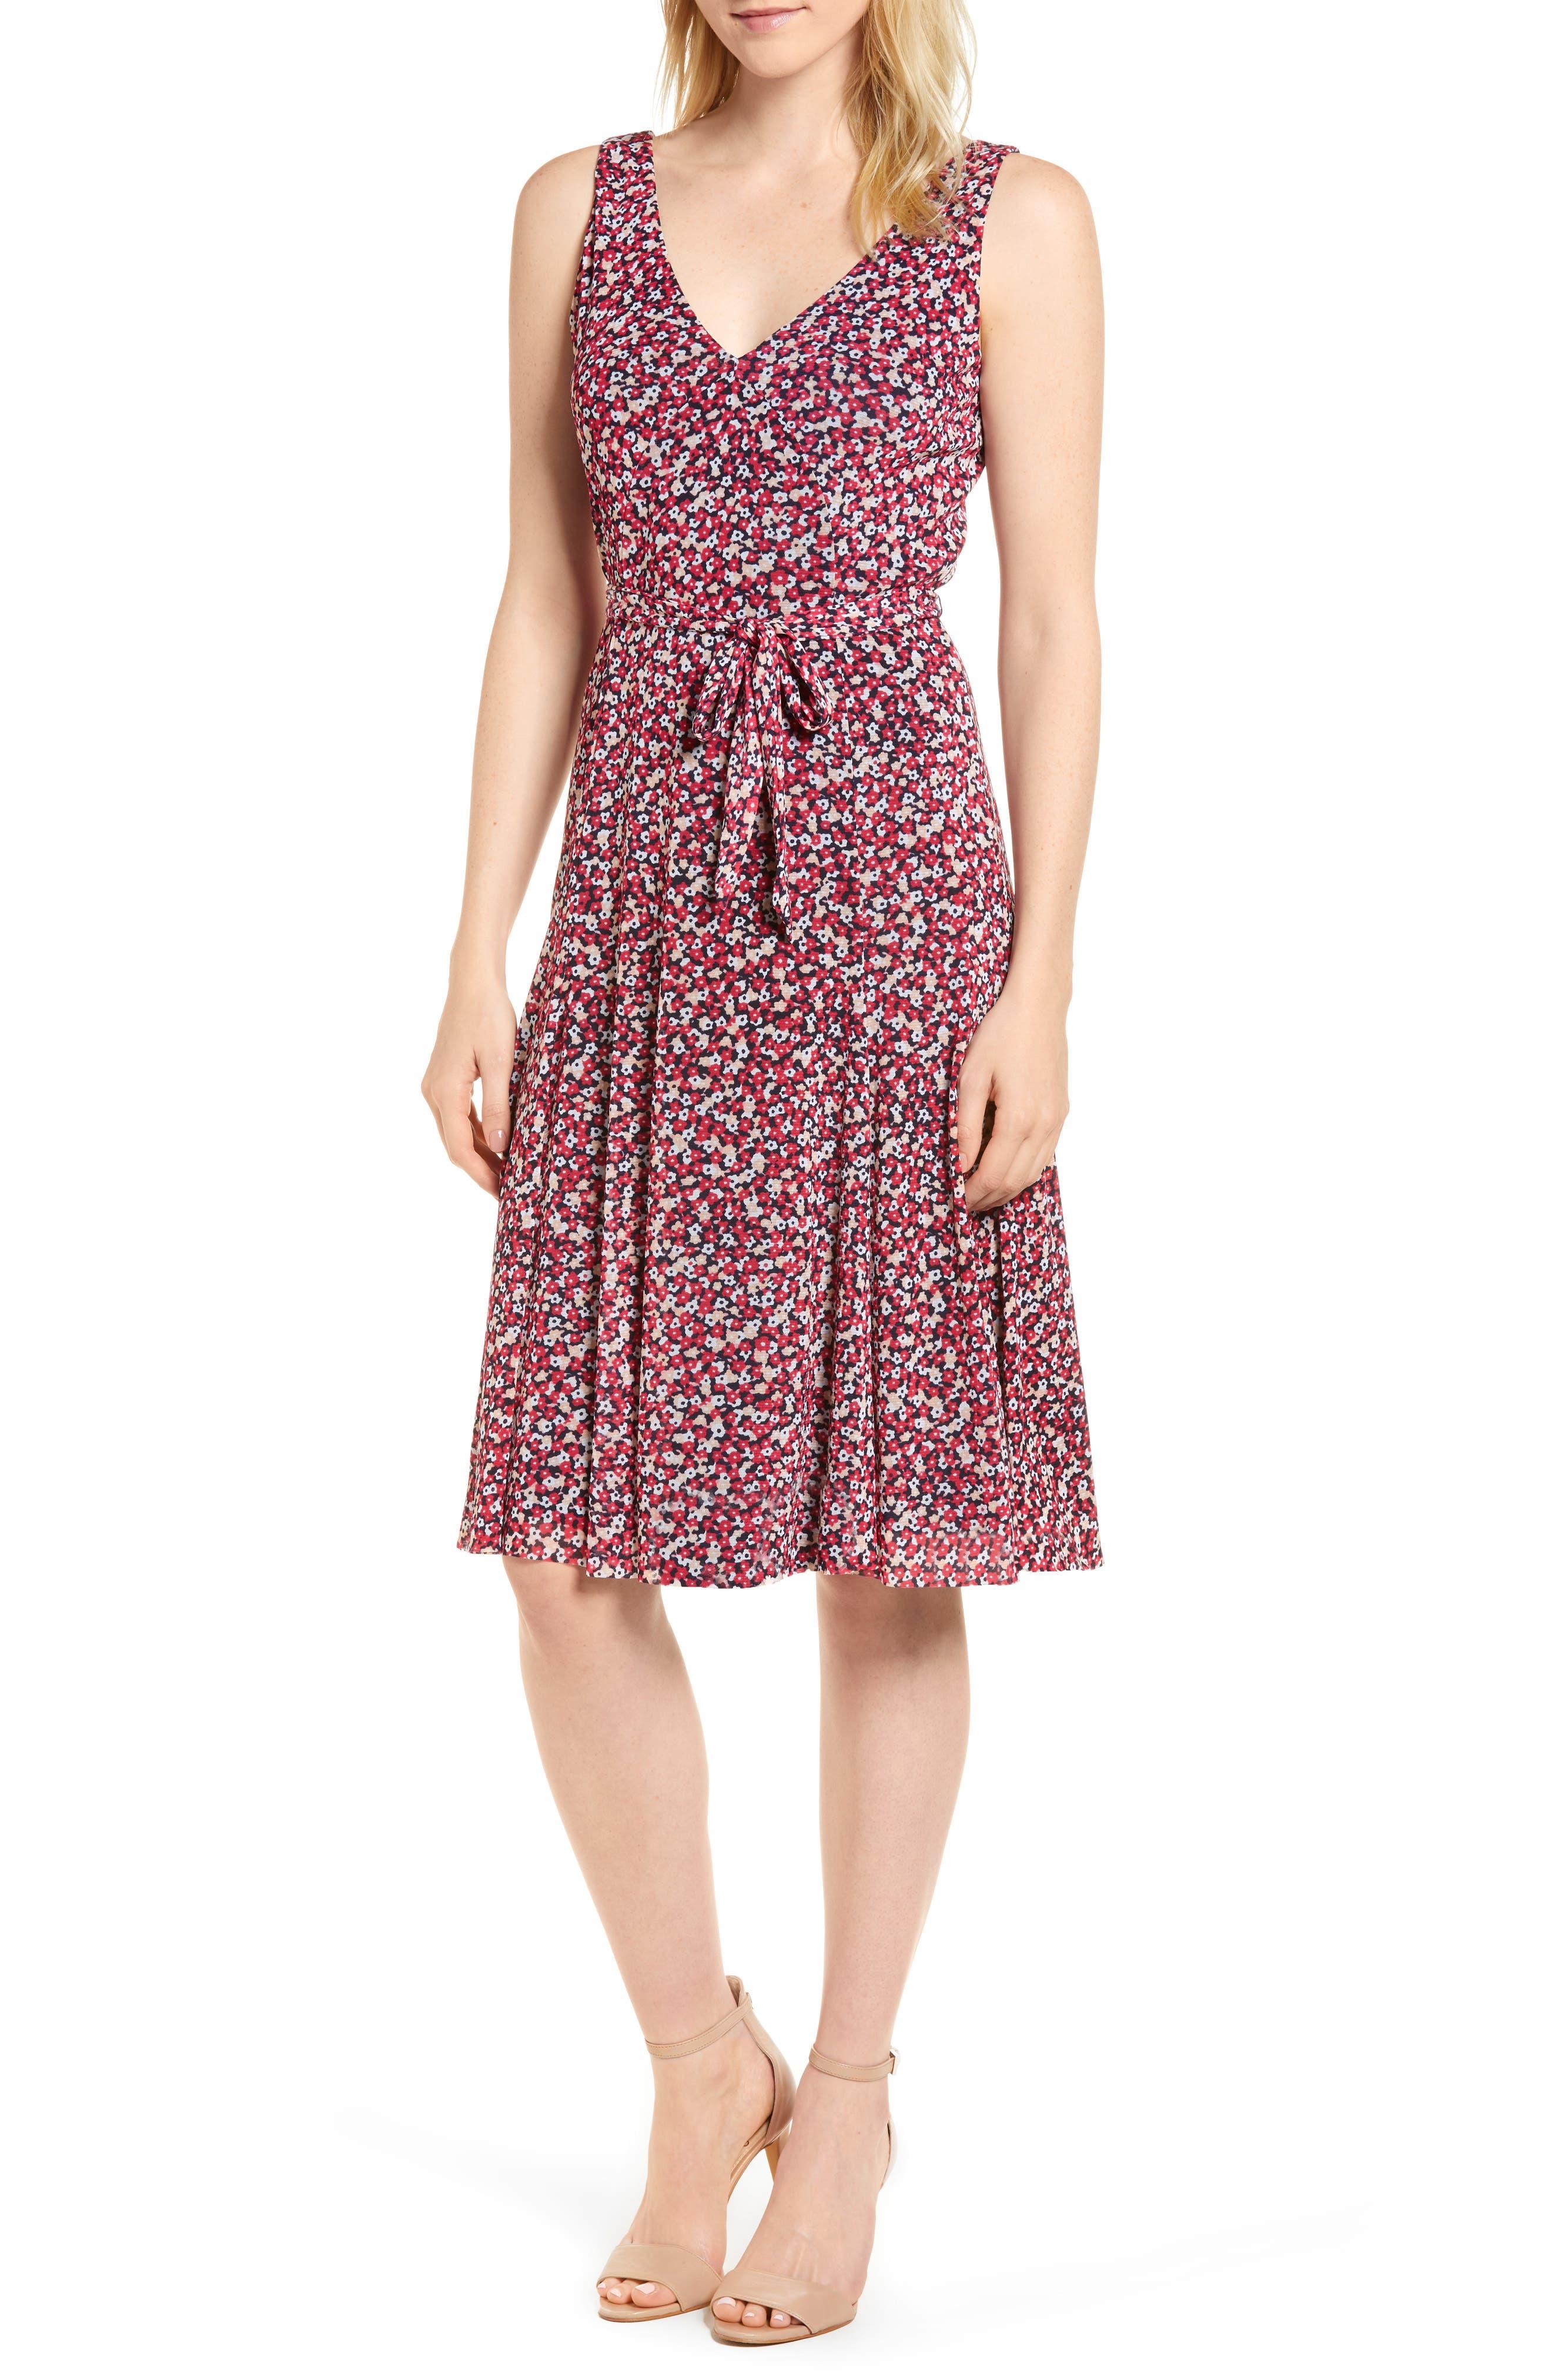 Floral Tank Dress,                         Main,                         color, True Navy/ Bright Blush